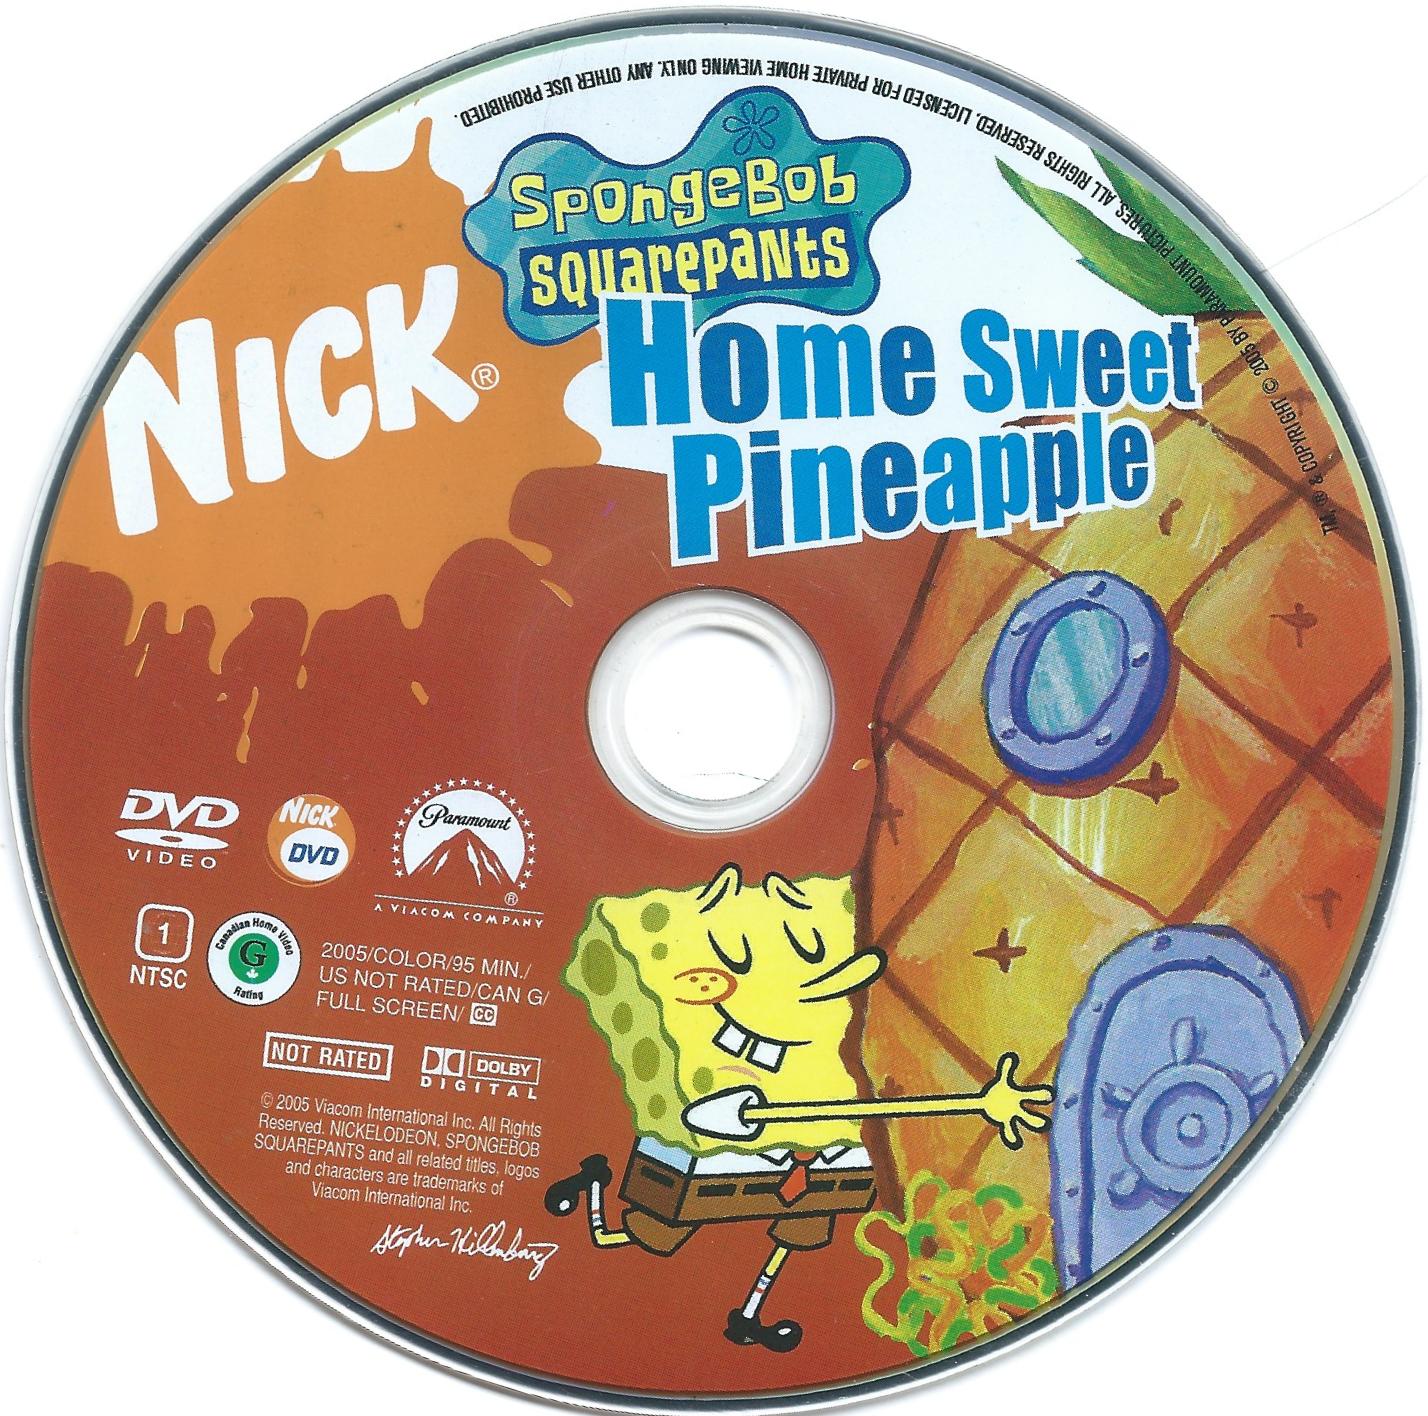 Home Sweet Pineapple (DVD)